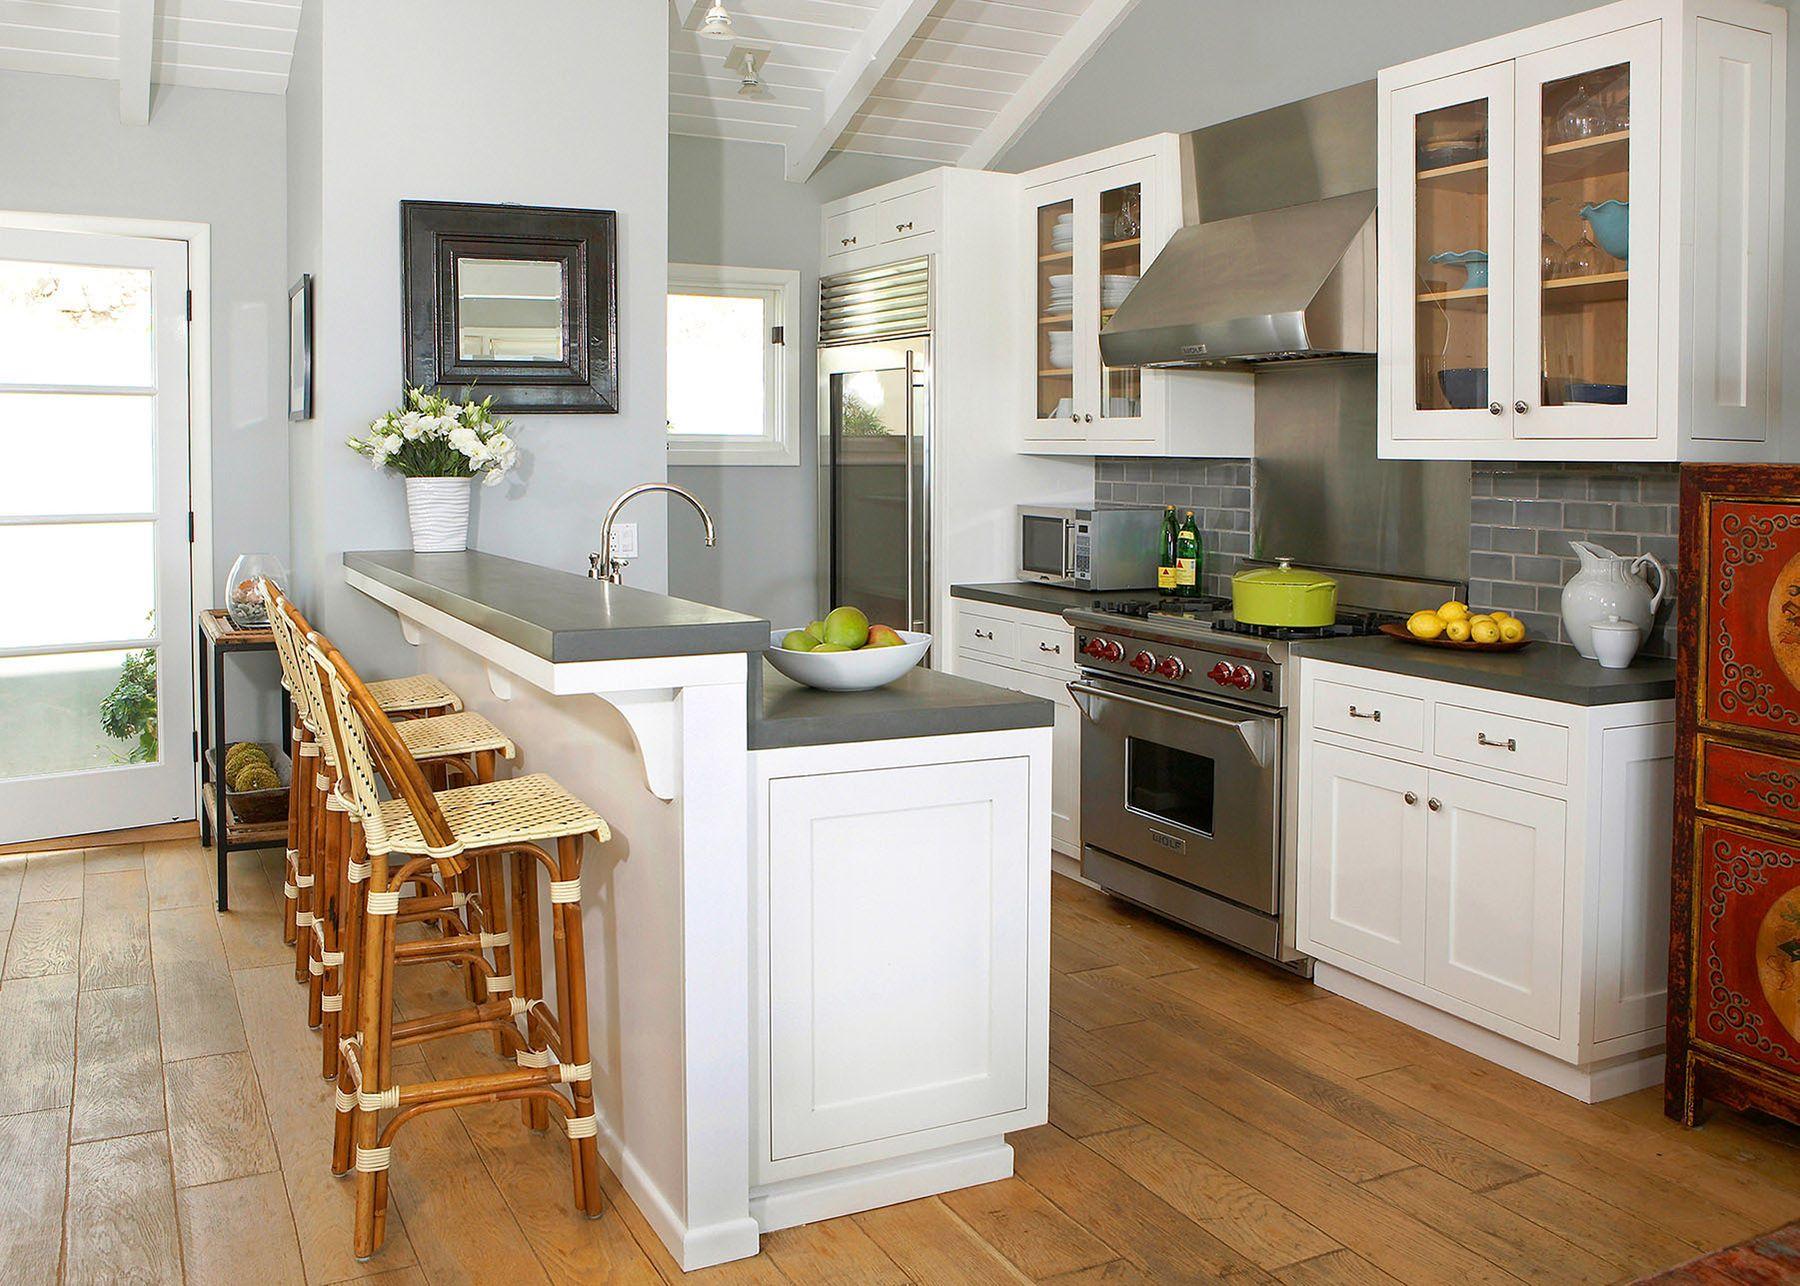 Kitchens & Dining 22.jpg